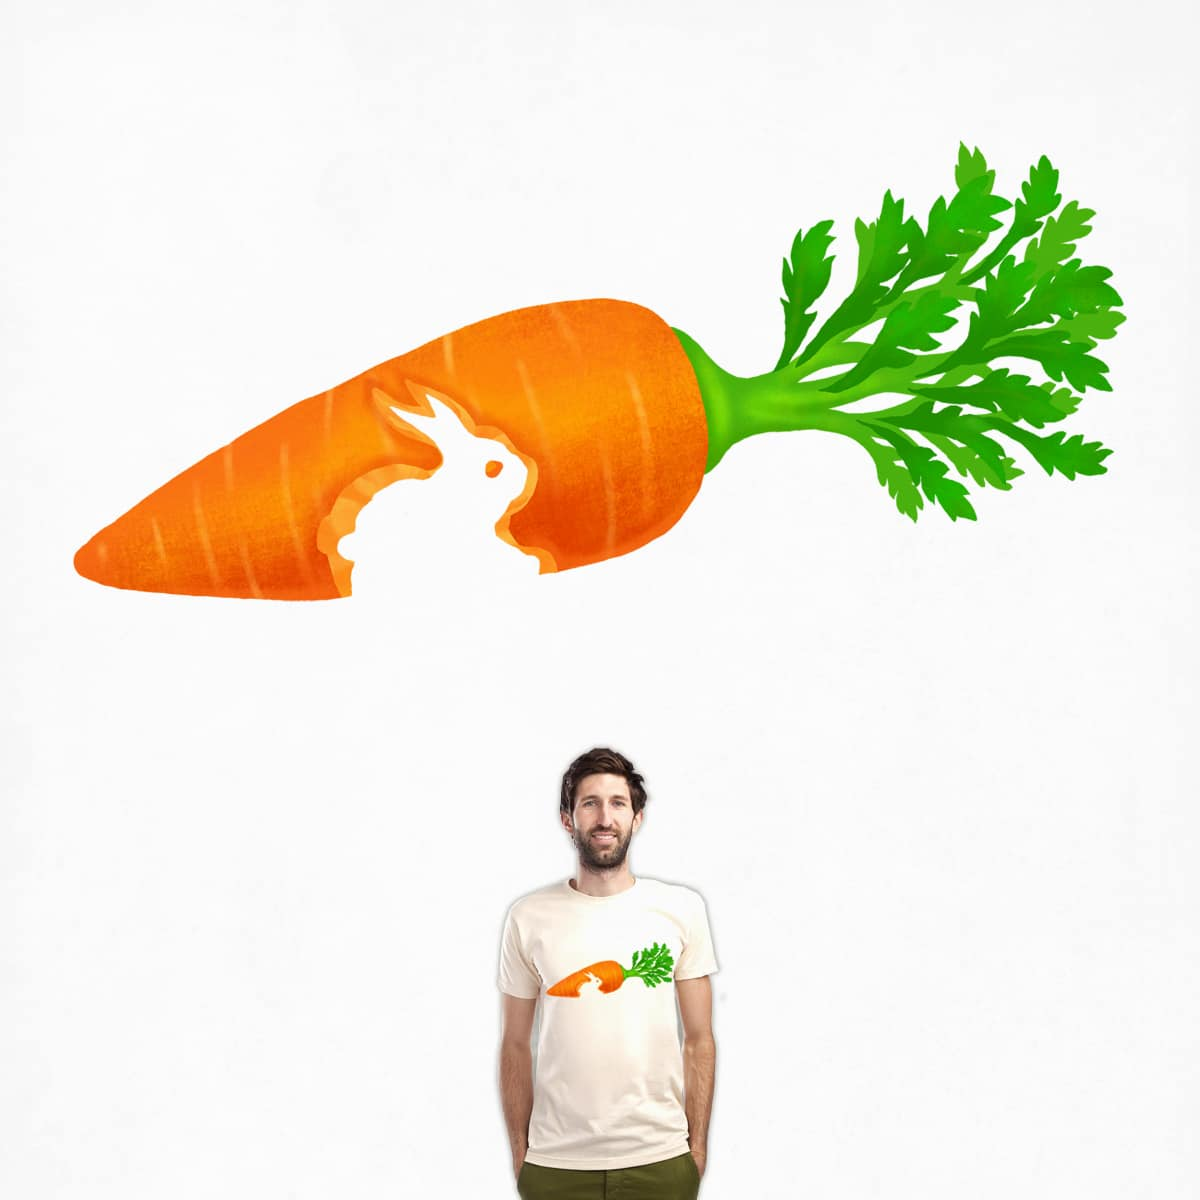 Carrot by ben chen on Threadless